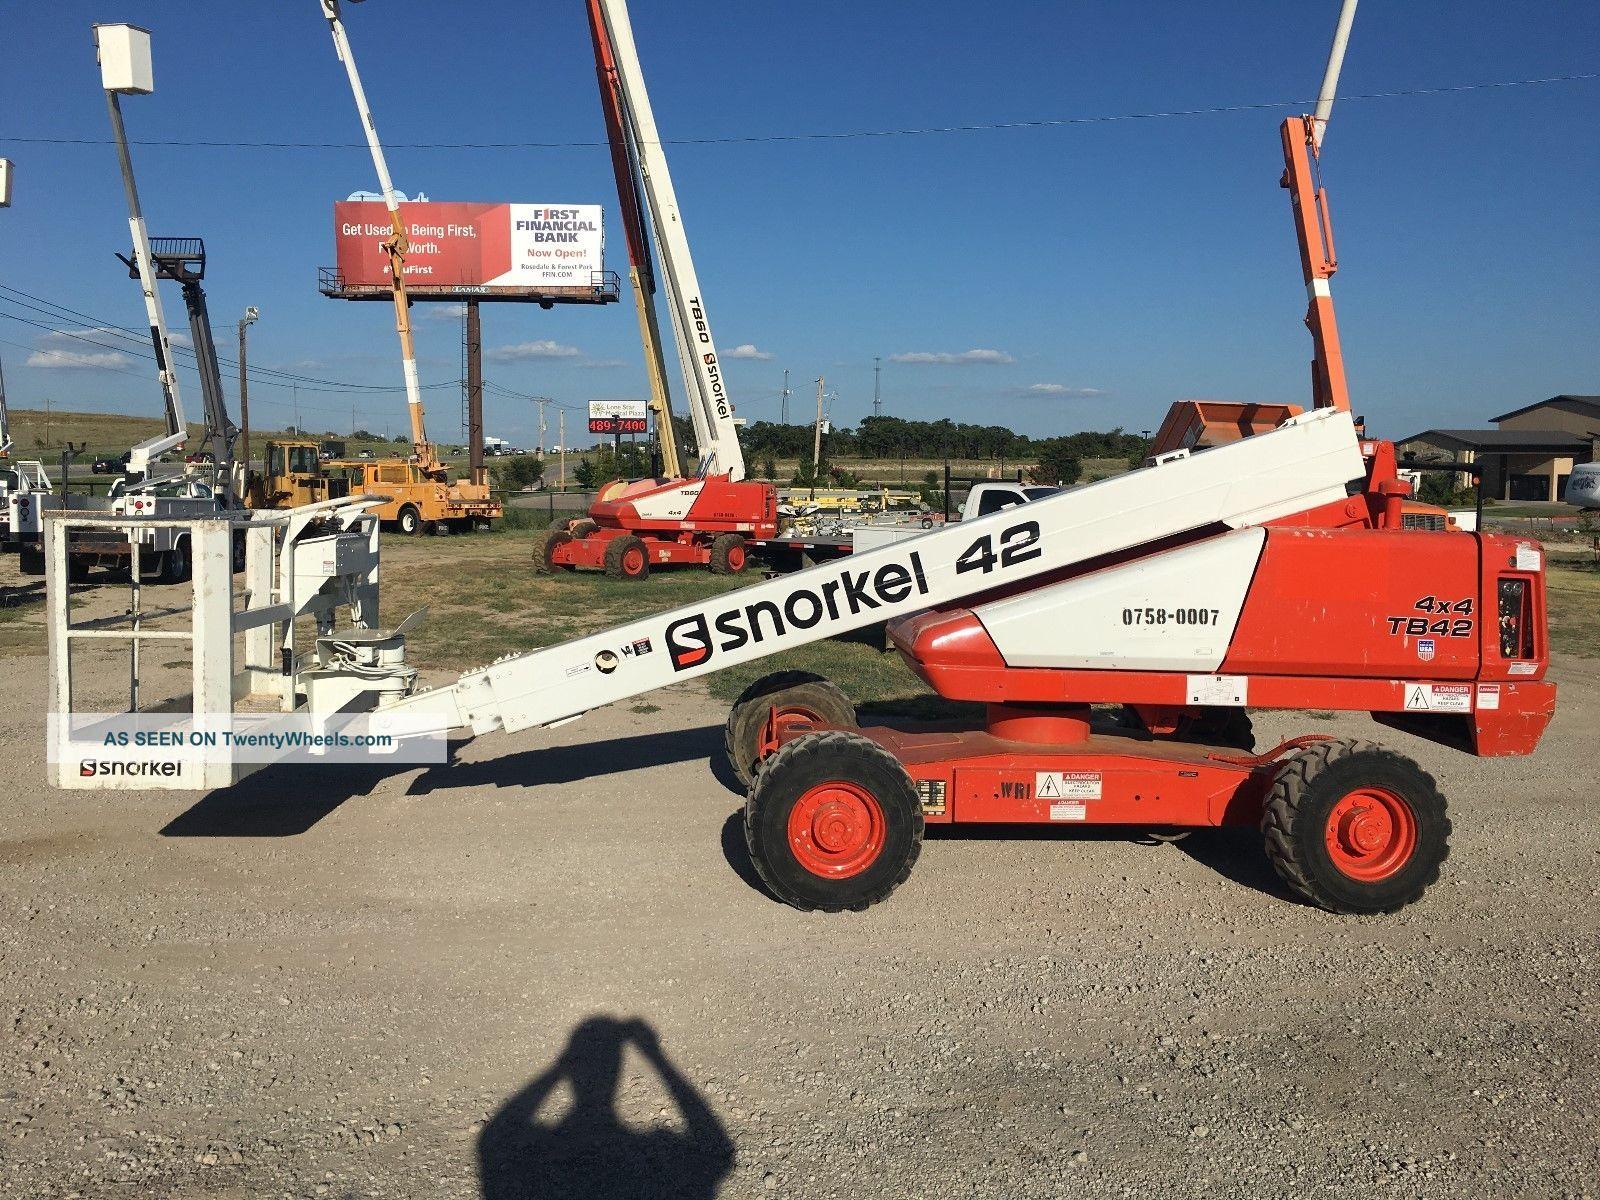 Snorkel Manlift Wiring Diagram Tb60 Electrical Diagrams Lift Tb42 Boom 42 Foot Diesel 4x4 Man Genie Jlg Runs Grea Ditch Witch